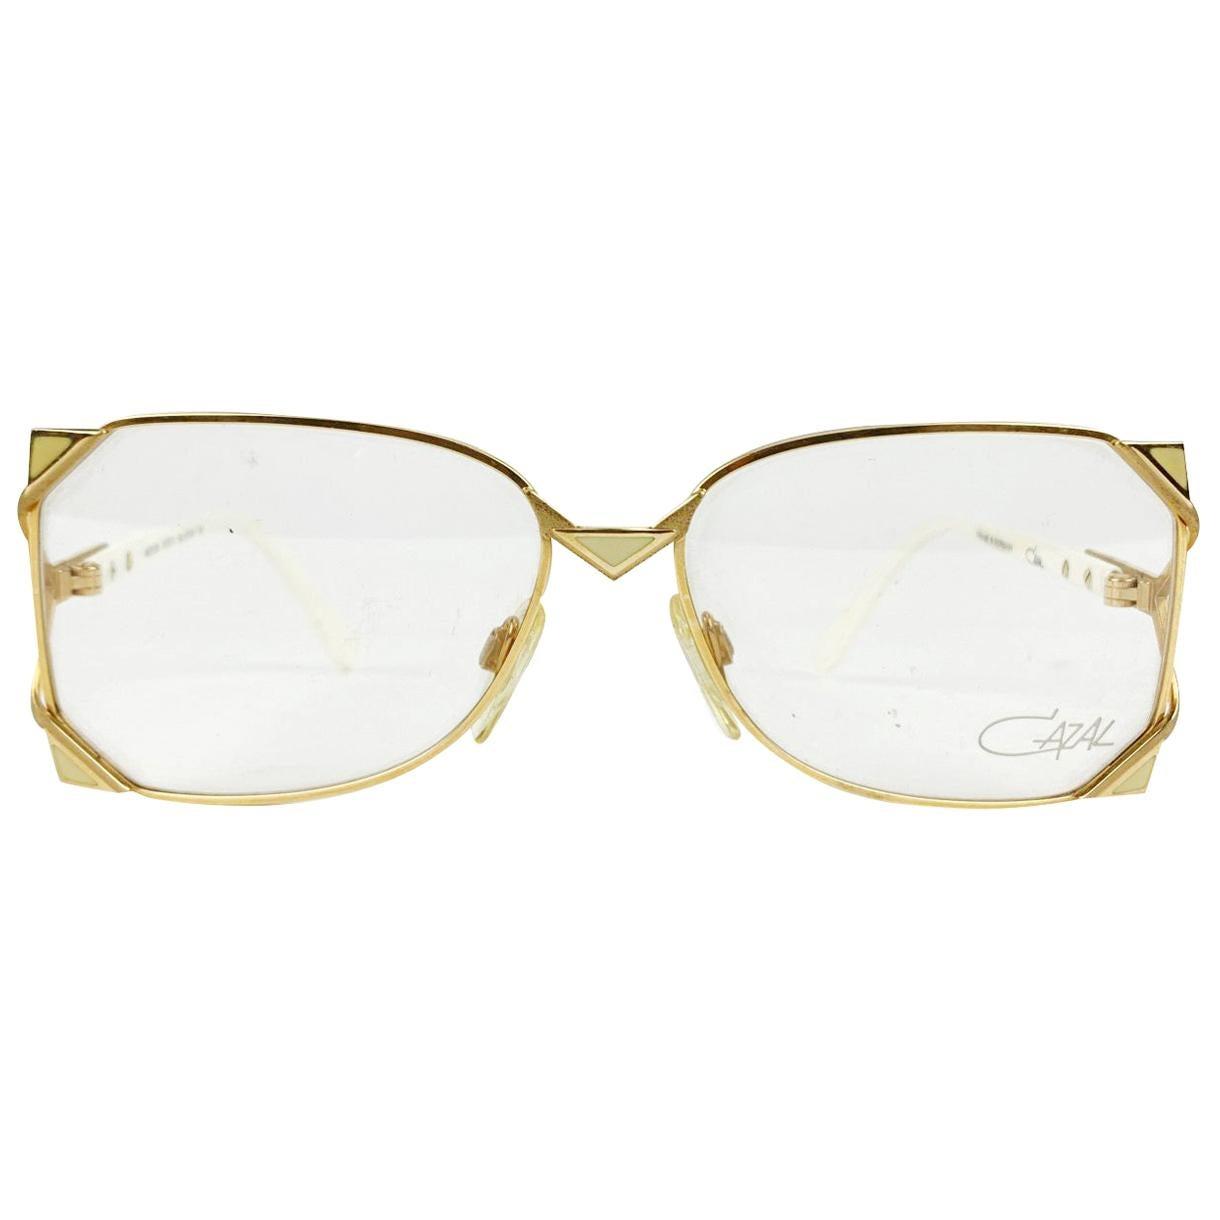 Cazal Vintage Gold Eyeglasses 236 57/15 125 mm West Germany